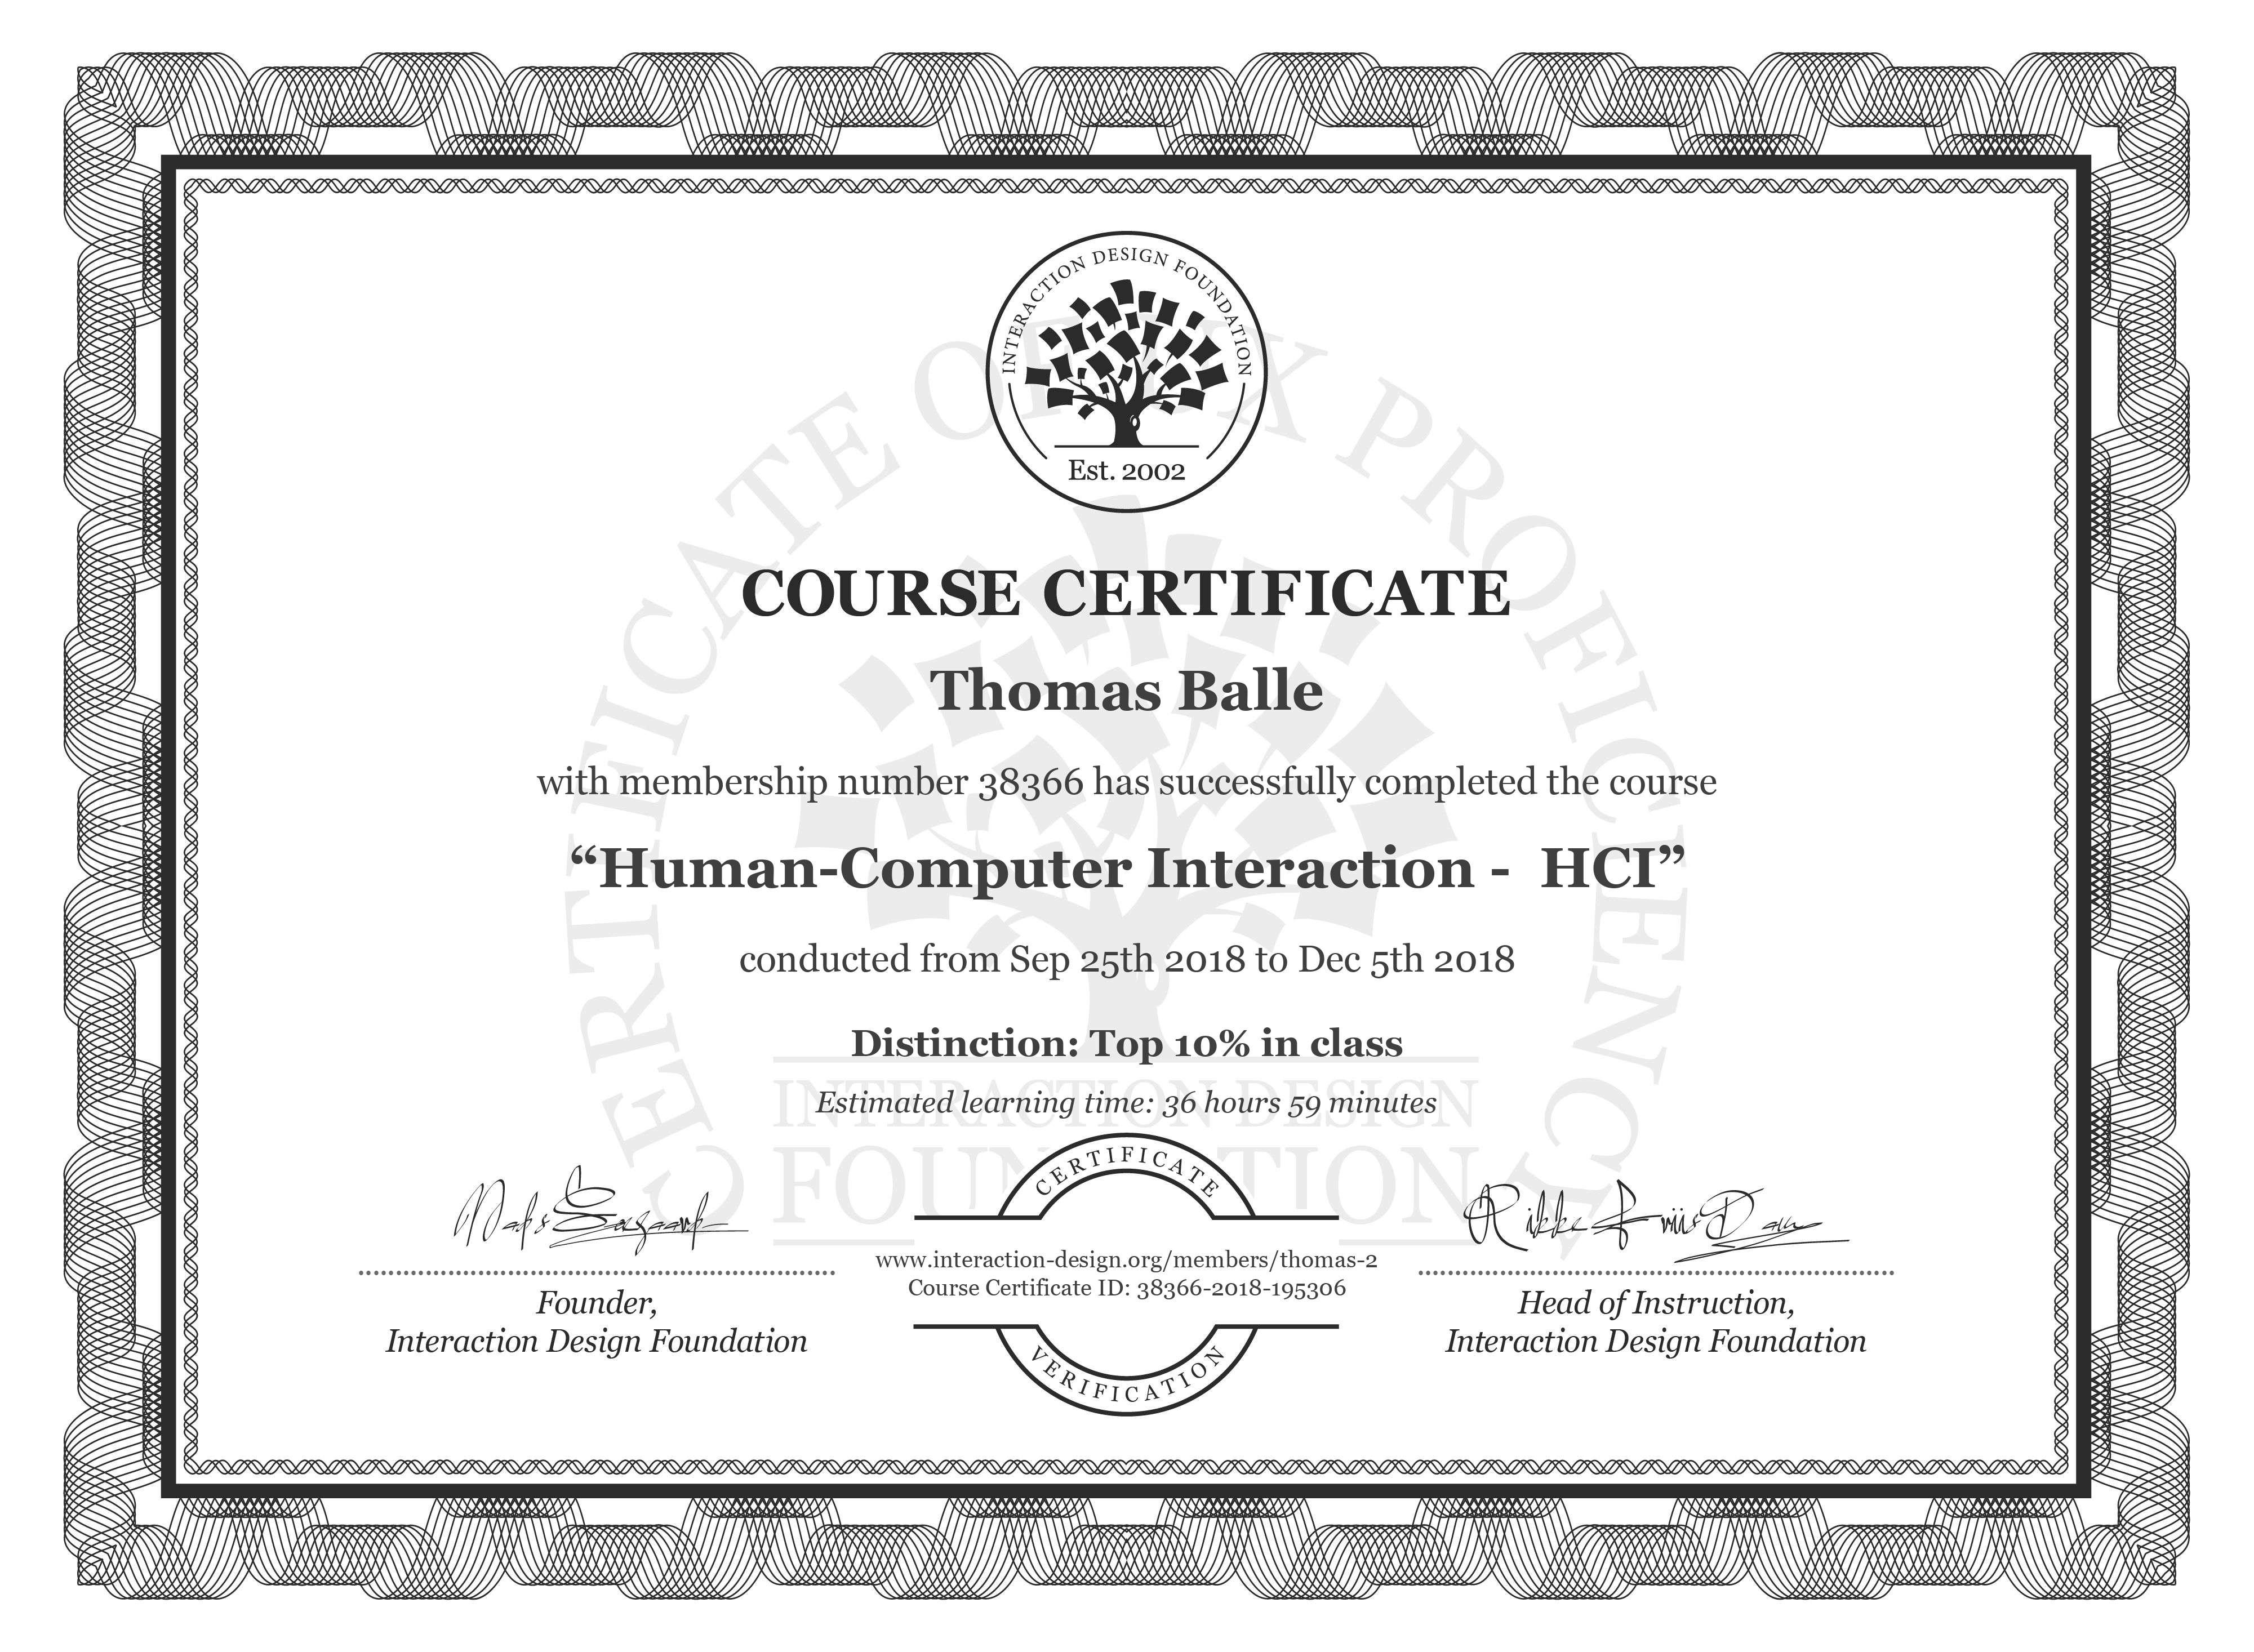 Thomas Balle: Course Certificate - Human-Computer Interaction -  HCI